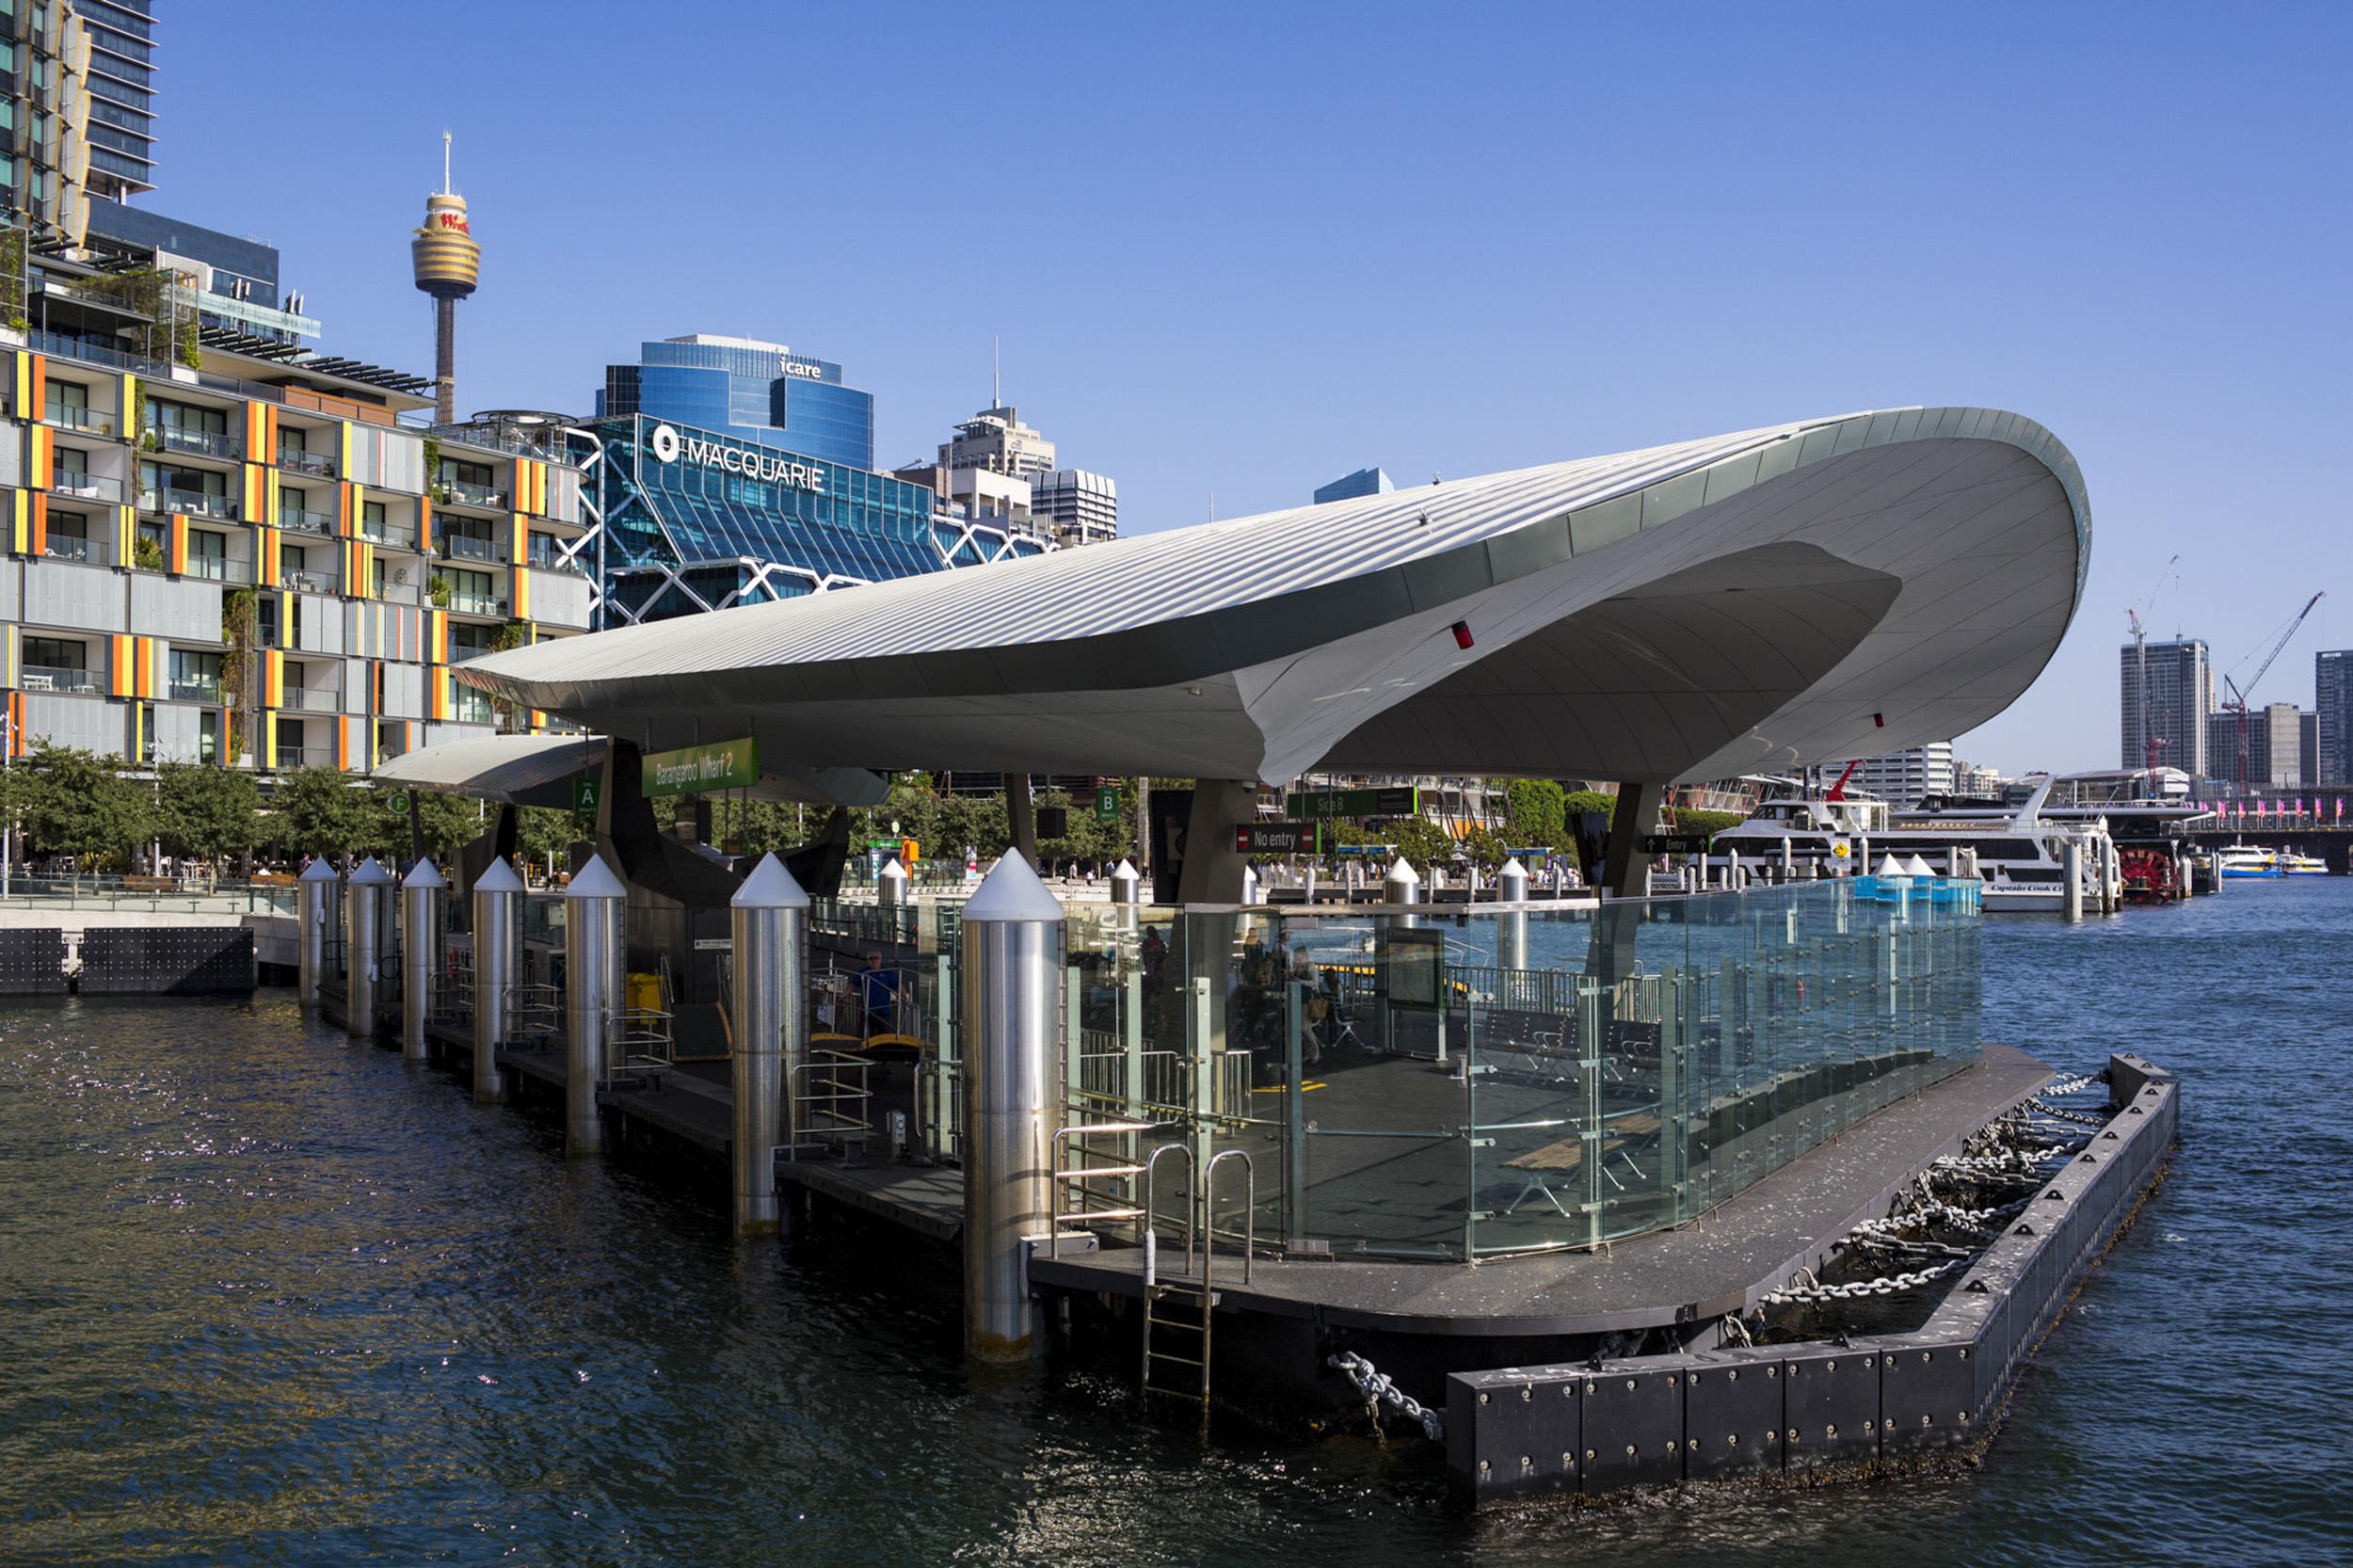 Barangaroo_wharf_cox_architecture_sydney_02.jpg